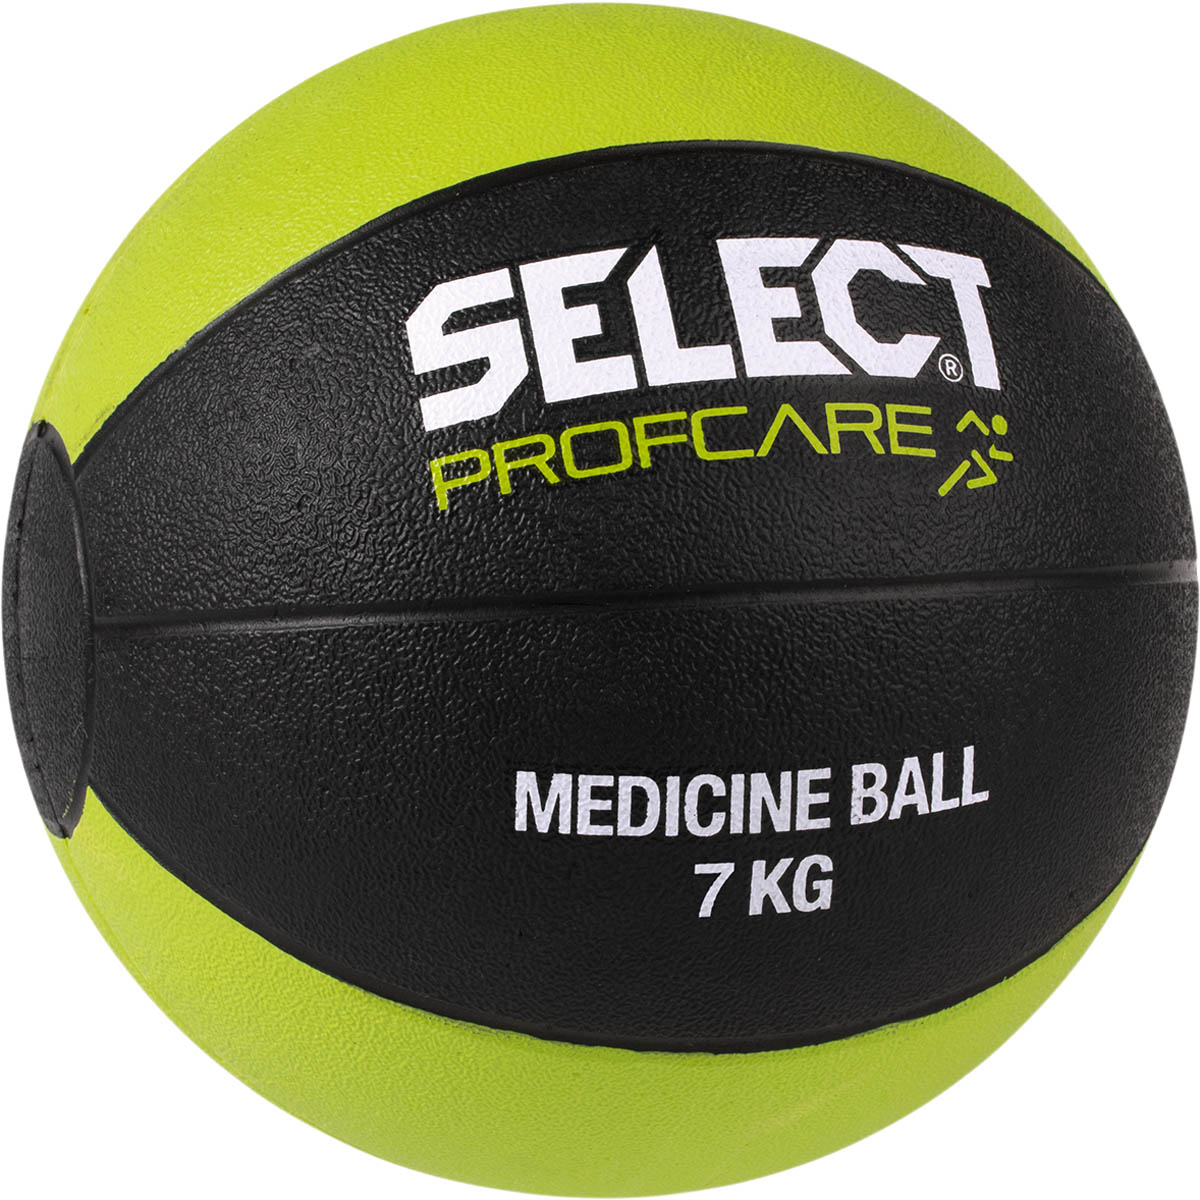 Select Medicine ball 7 kg